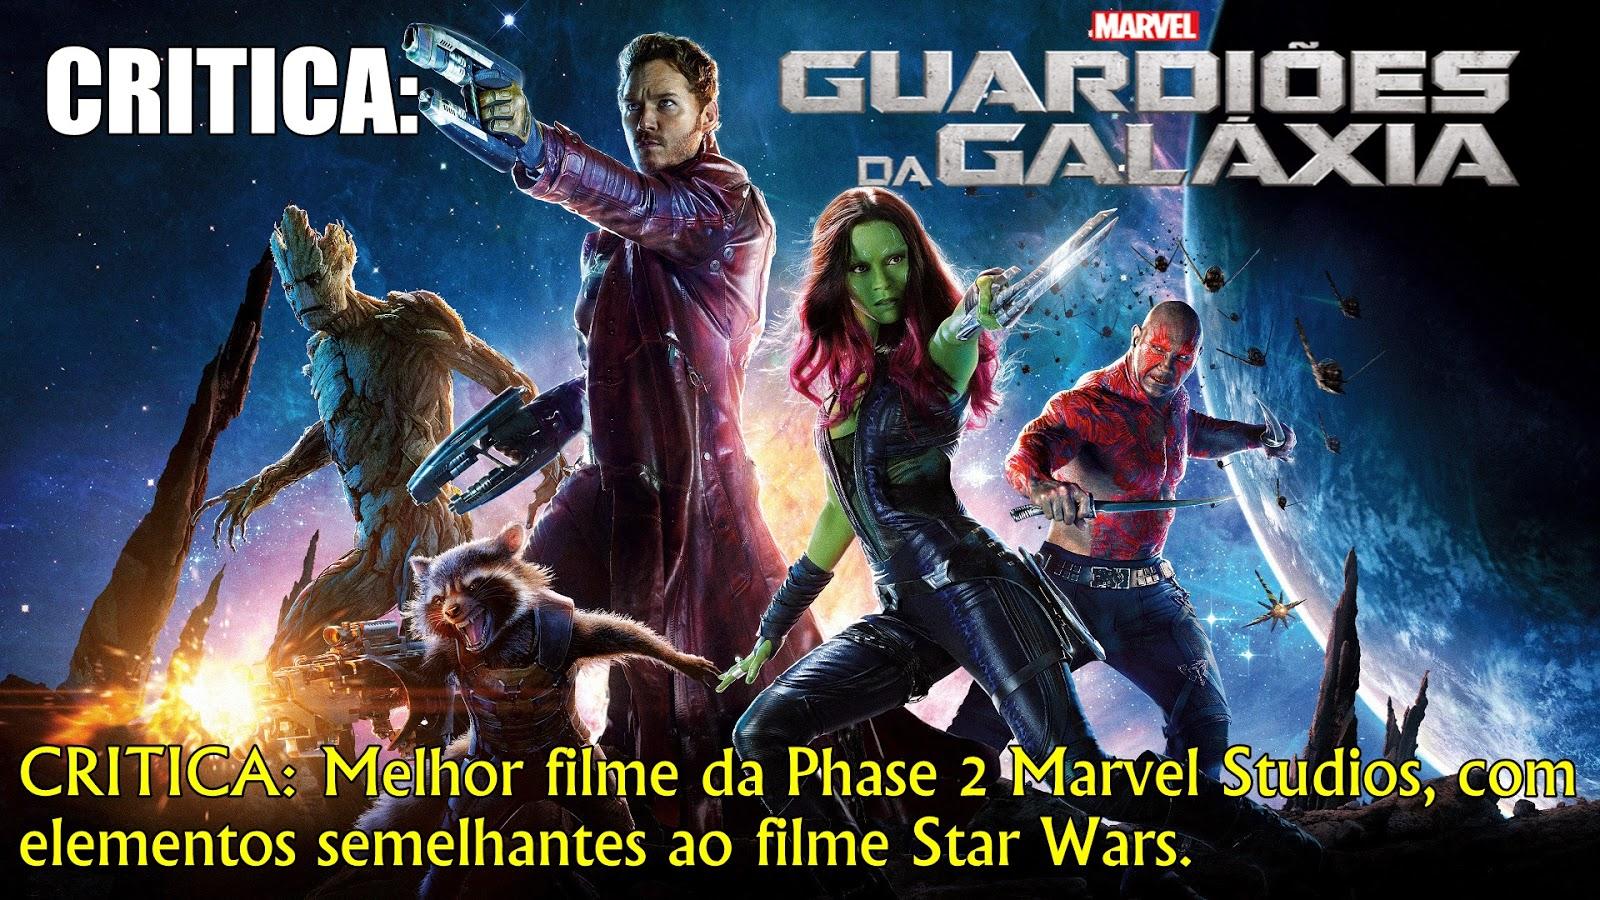 http://www.essb-nero.blogspot.com.br/2014/08/guardioes-da-galaxia-critica.html